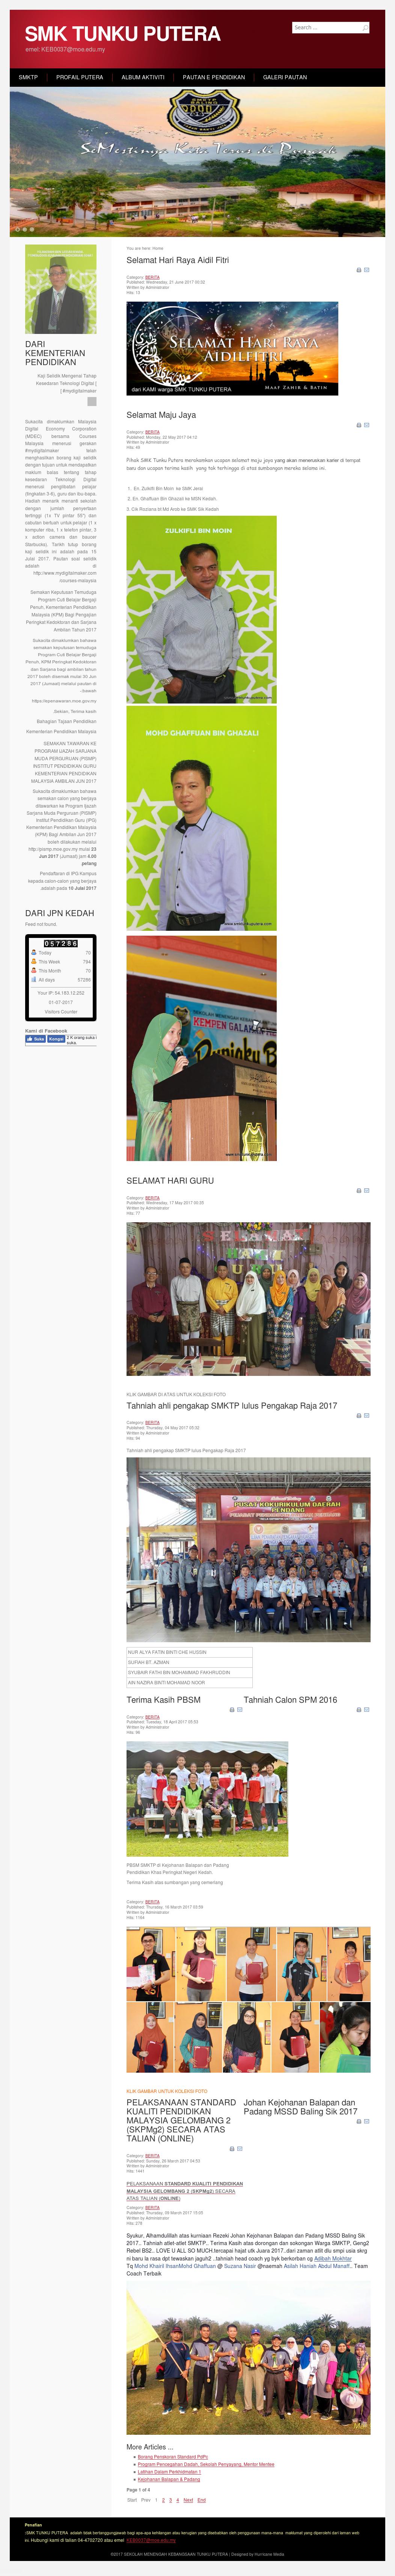 Smk Tunku Putera Competitors, Revenue and Employees - Owler Company